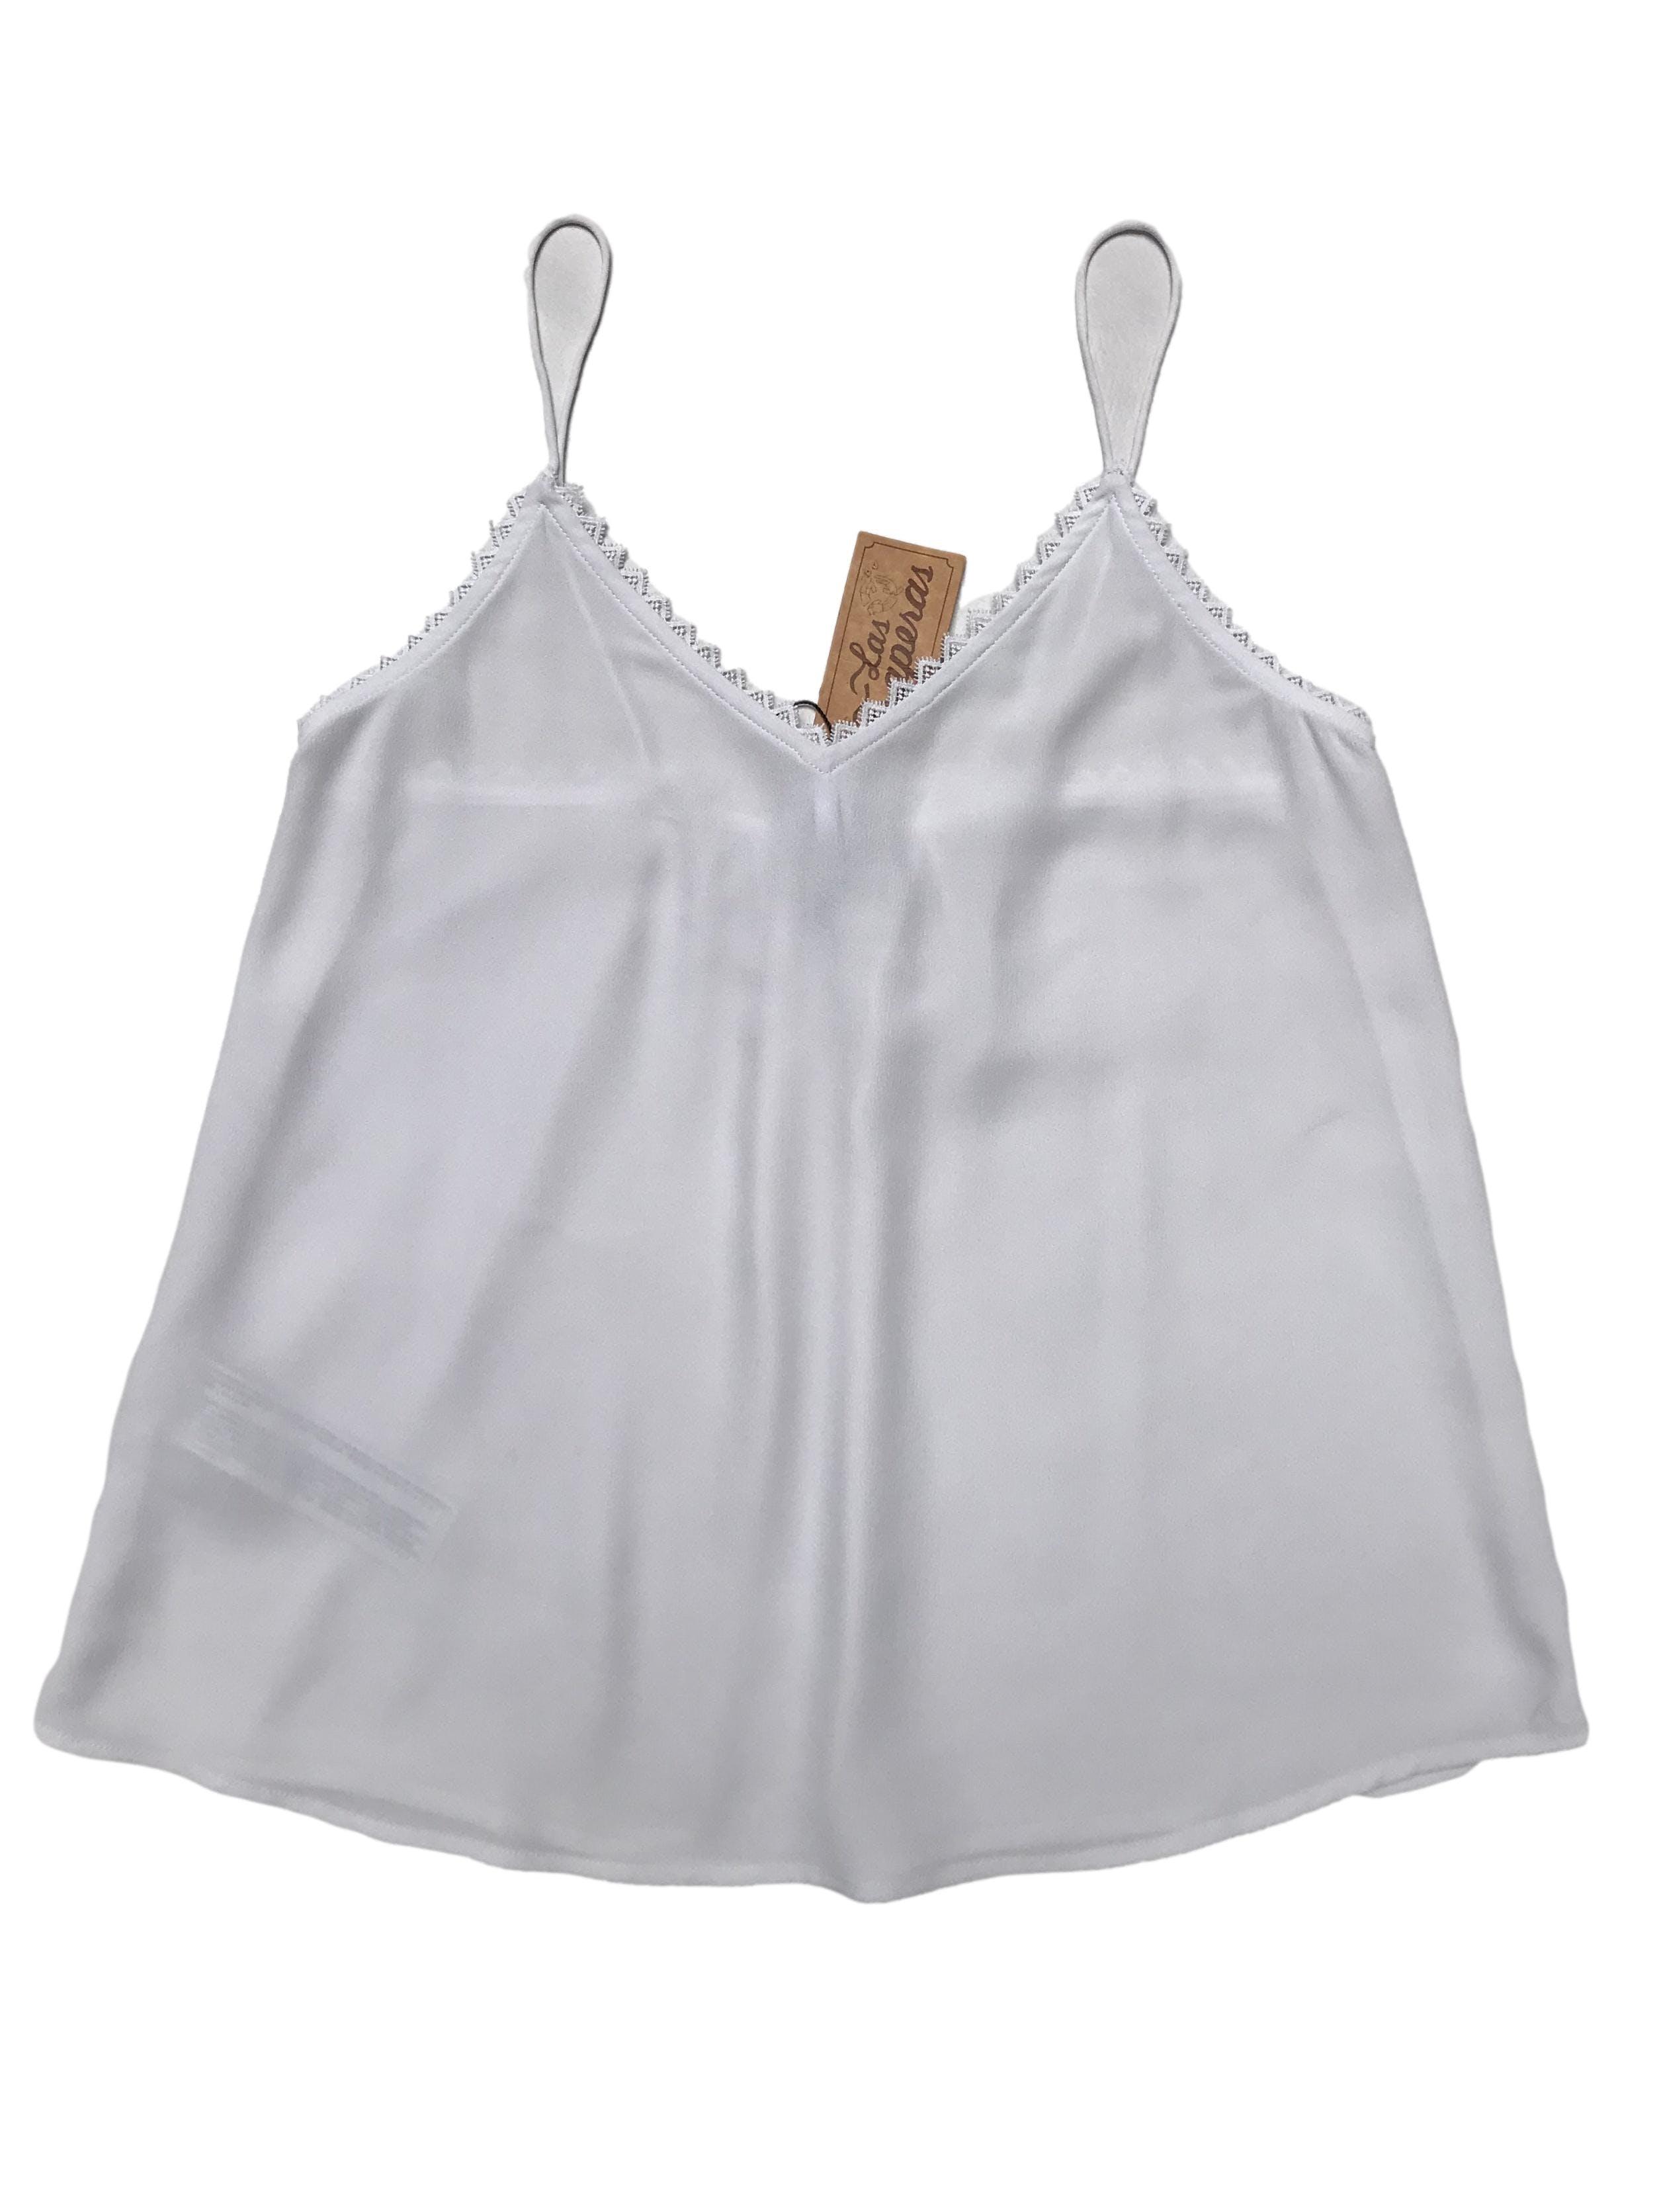 Blusa Mango de tiritas, tela crepé con guipur en escote, corte suelto. Busto 88cm Largo desde sisa 38cm